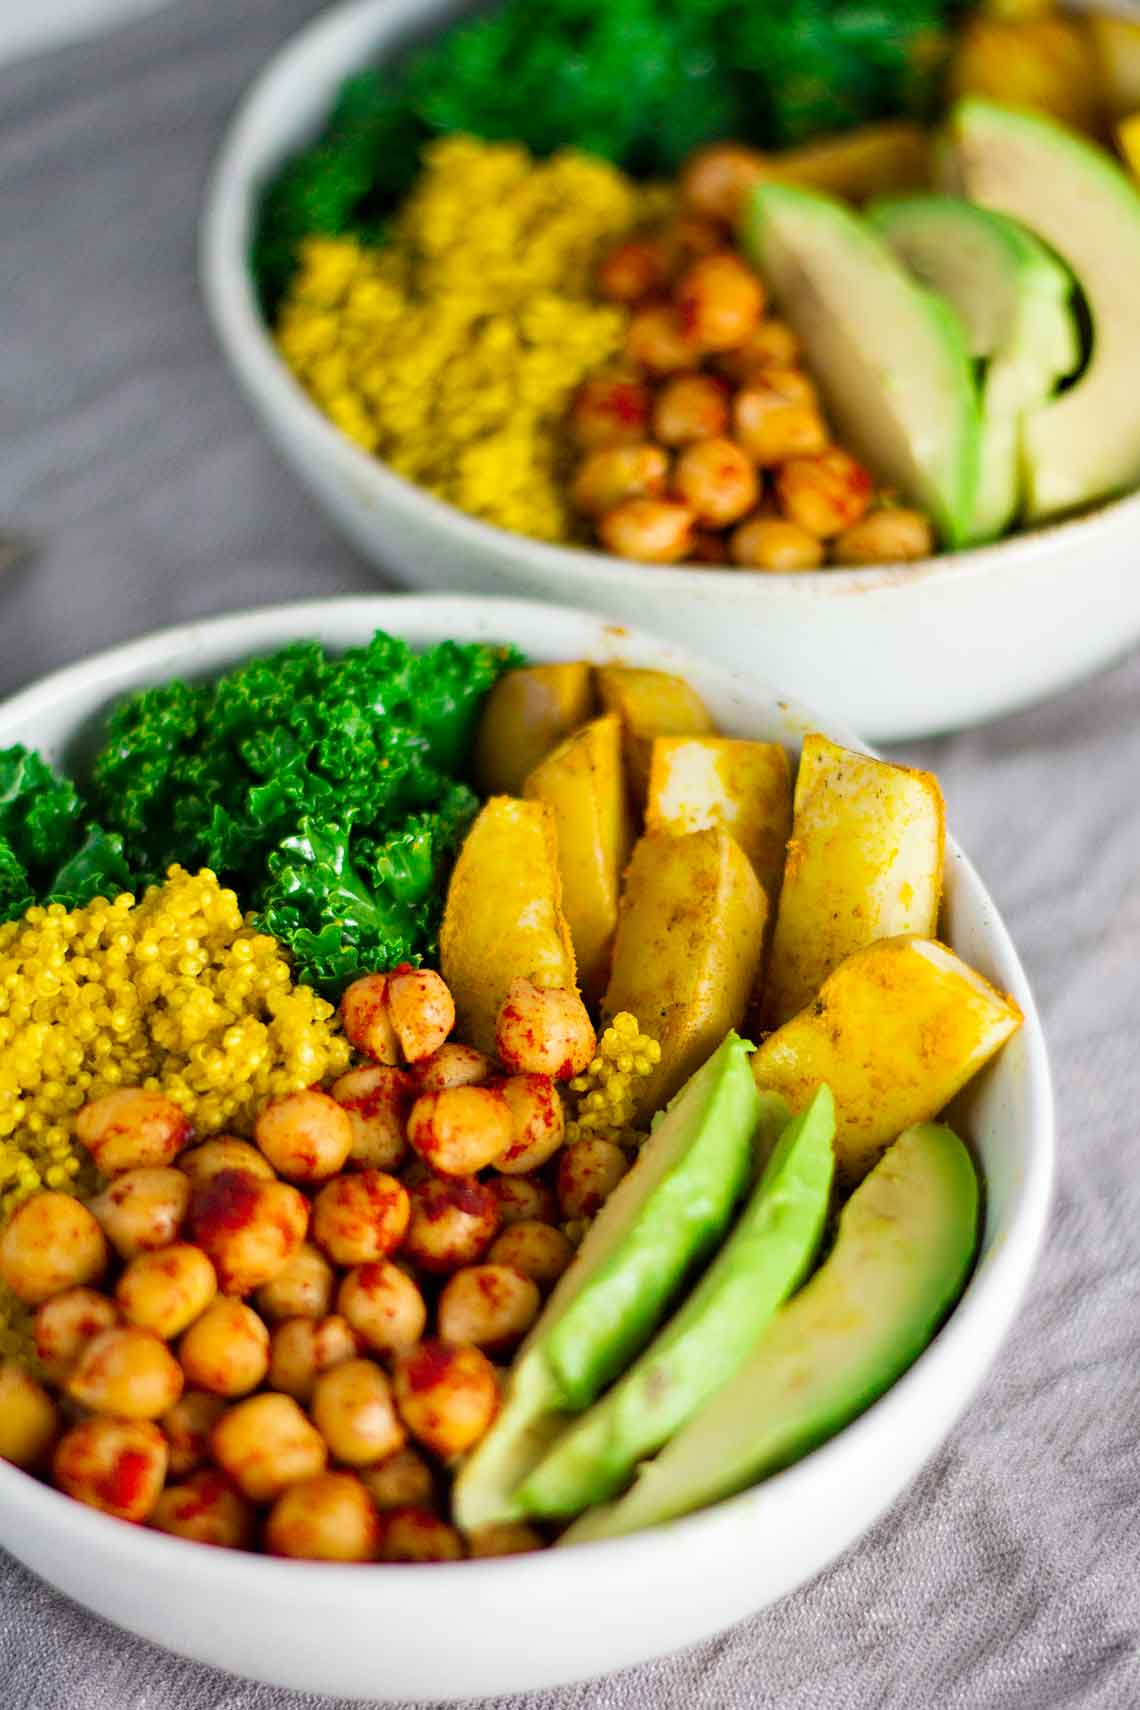 Vegan Turmeric Quinoa Power Bowl - Source: Jaroflemons.com